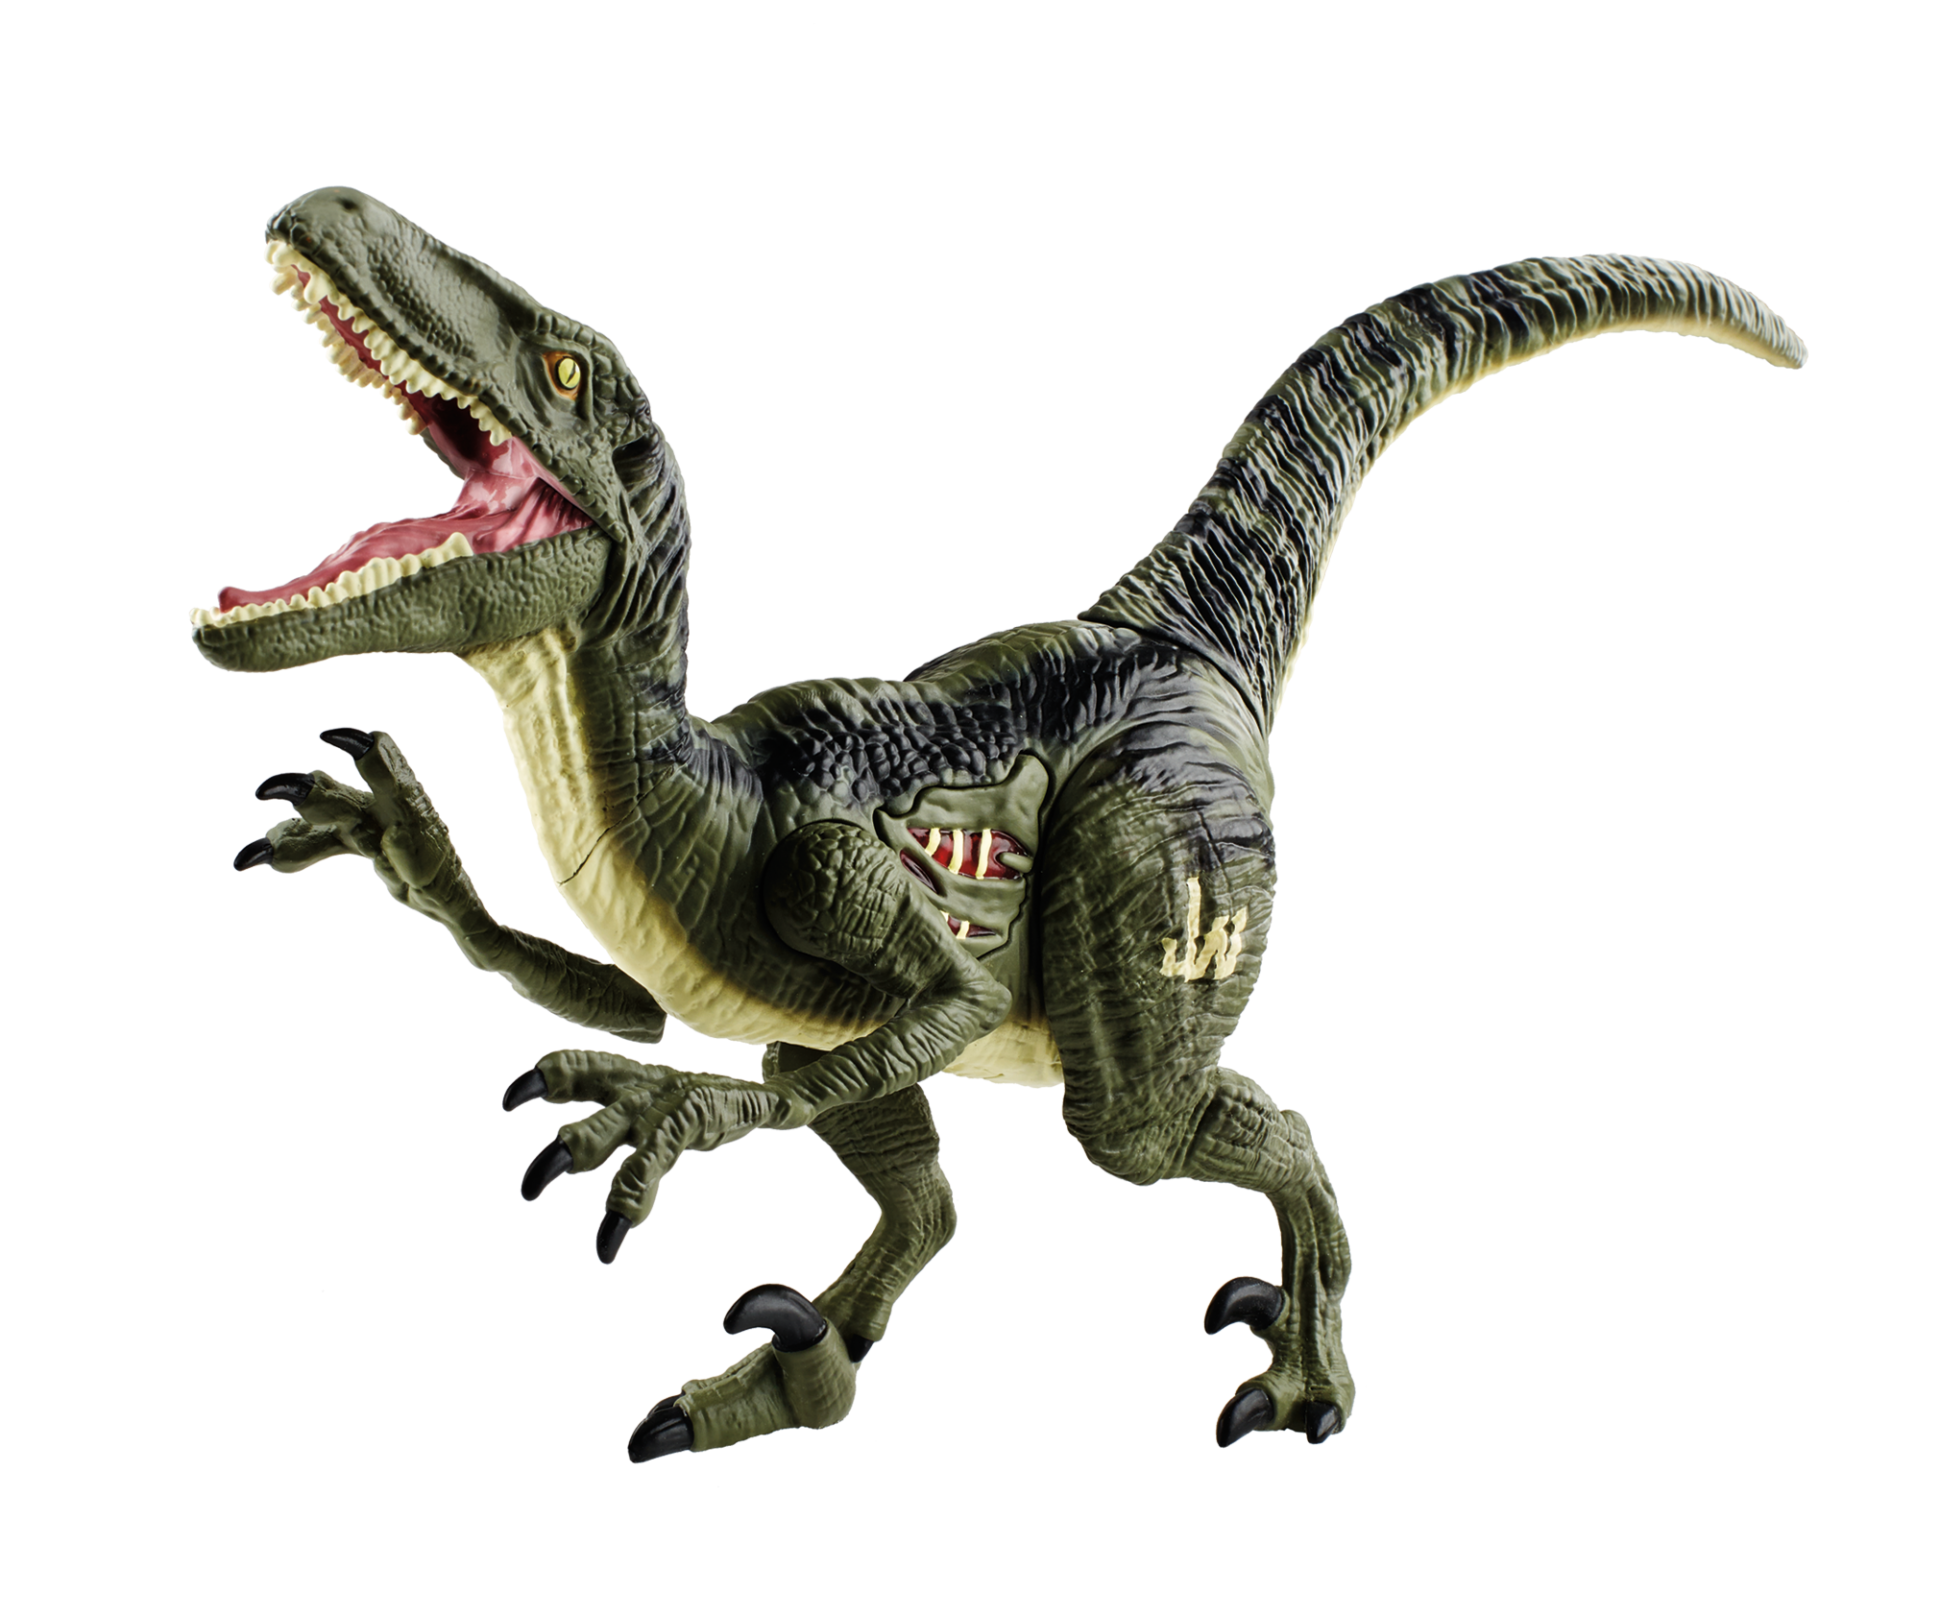 Dinosaur Png PNG Image - Dinosaur Bones PNG HD